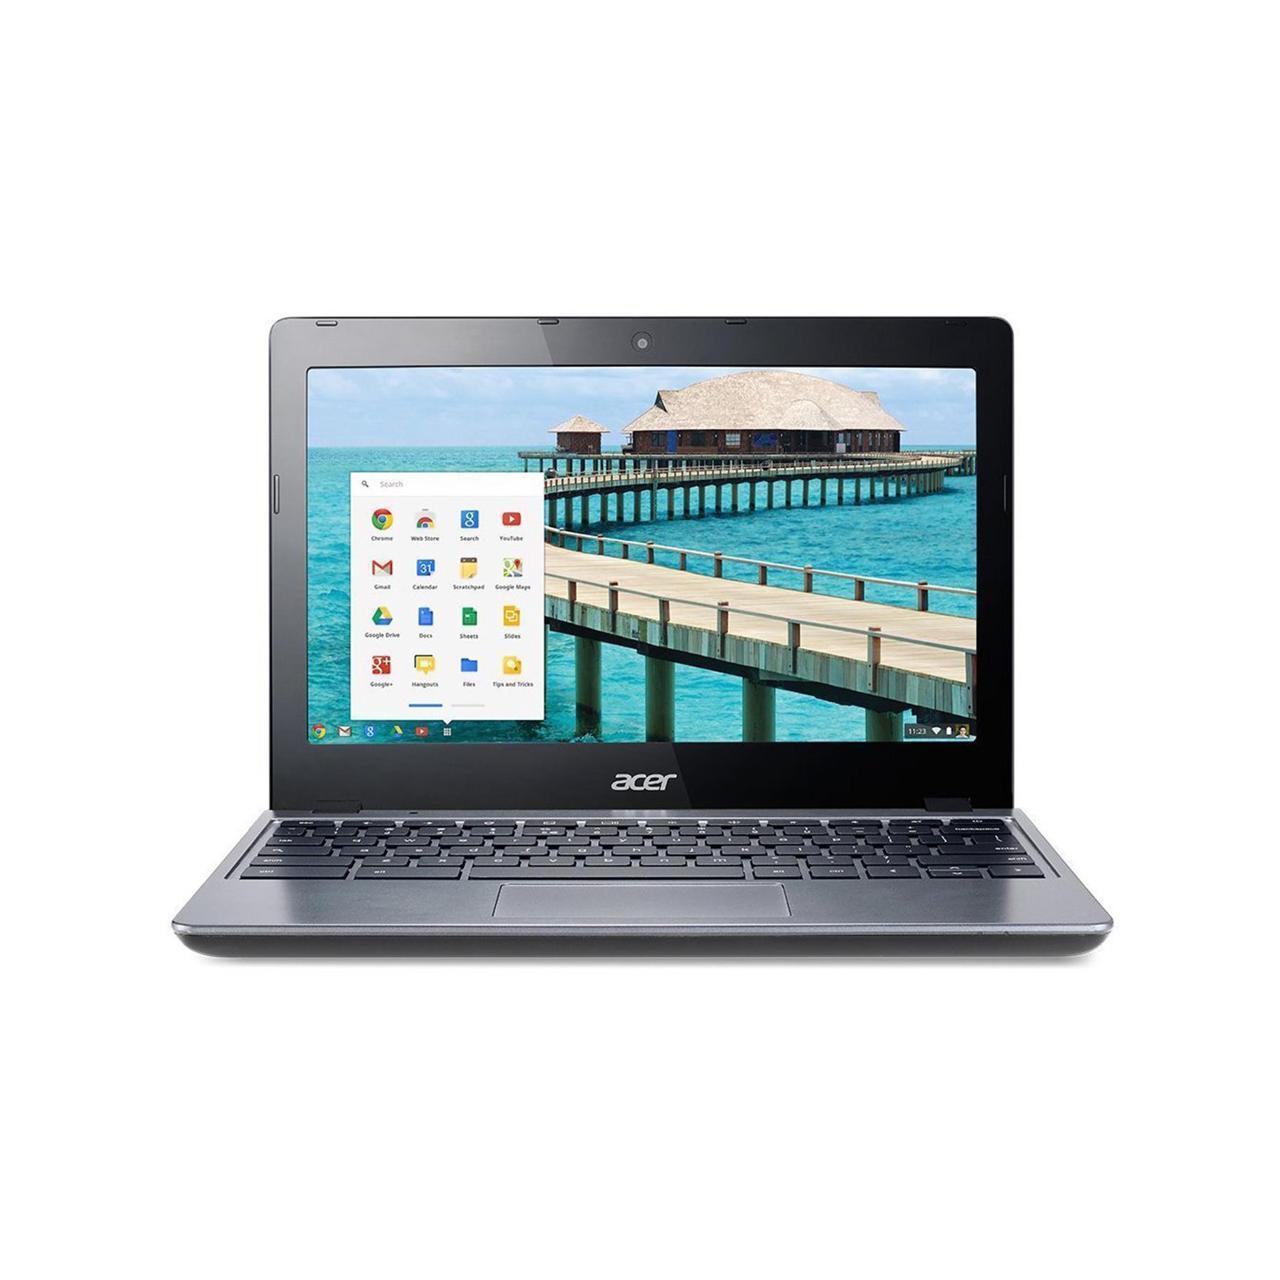 Acer Chromebook C720 Celeron 2955U 1.4 GHz - SSD 16 GB - 4 GB